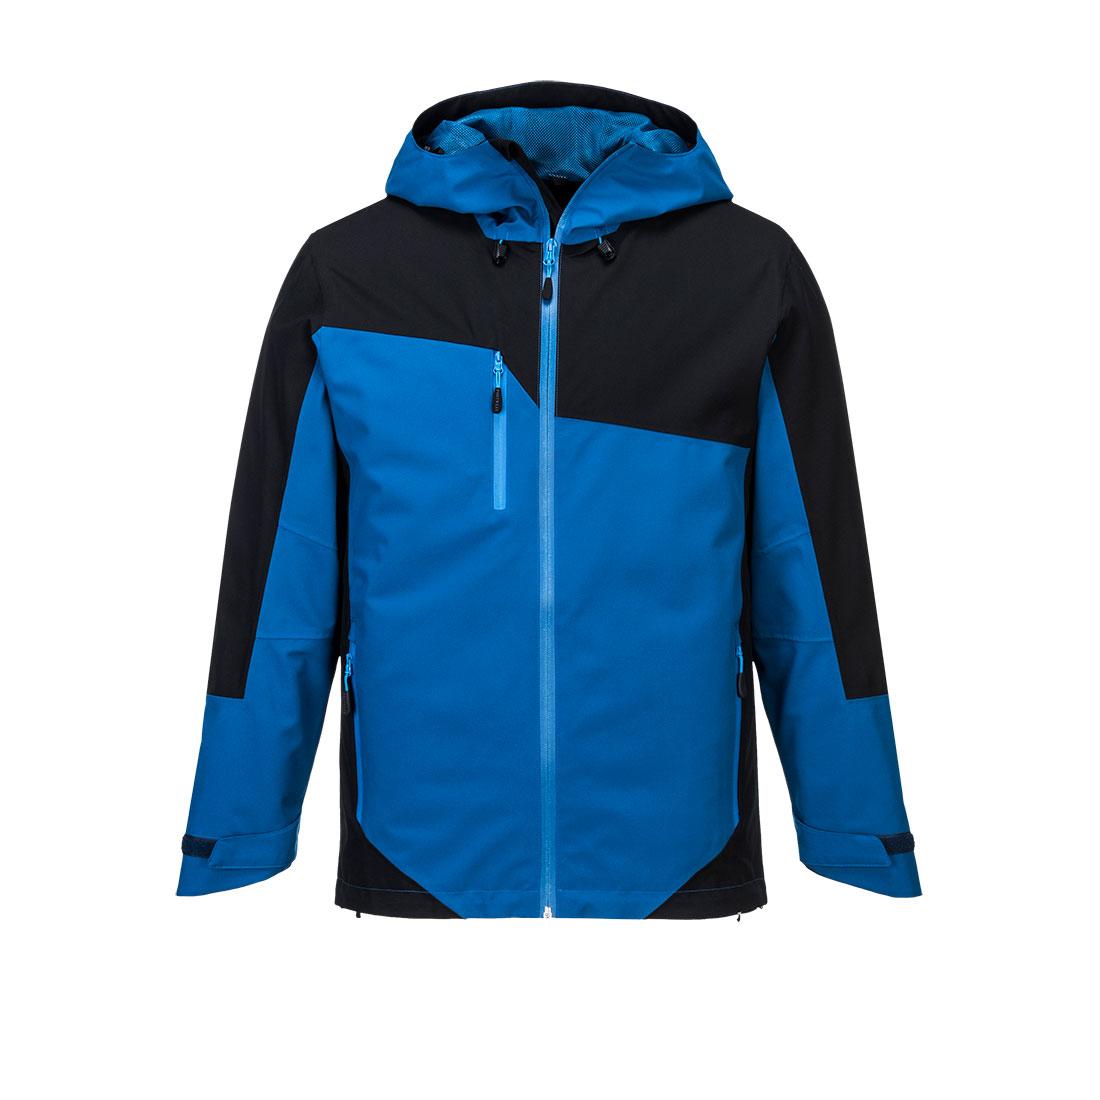 Portwest X3 Two-Tone Jacket Blue/Black Large